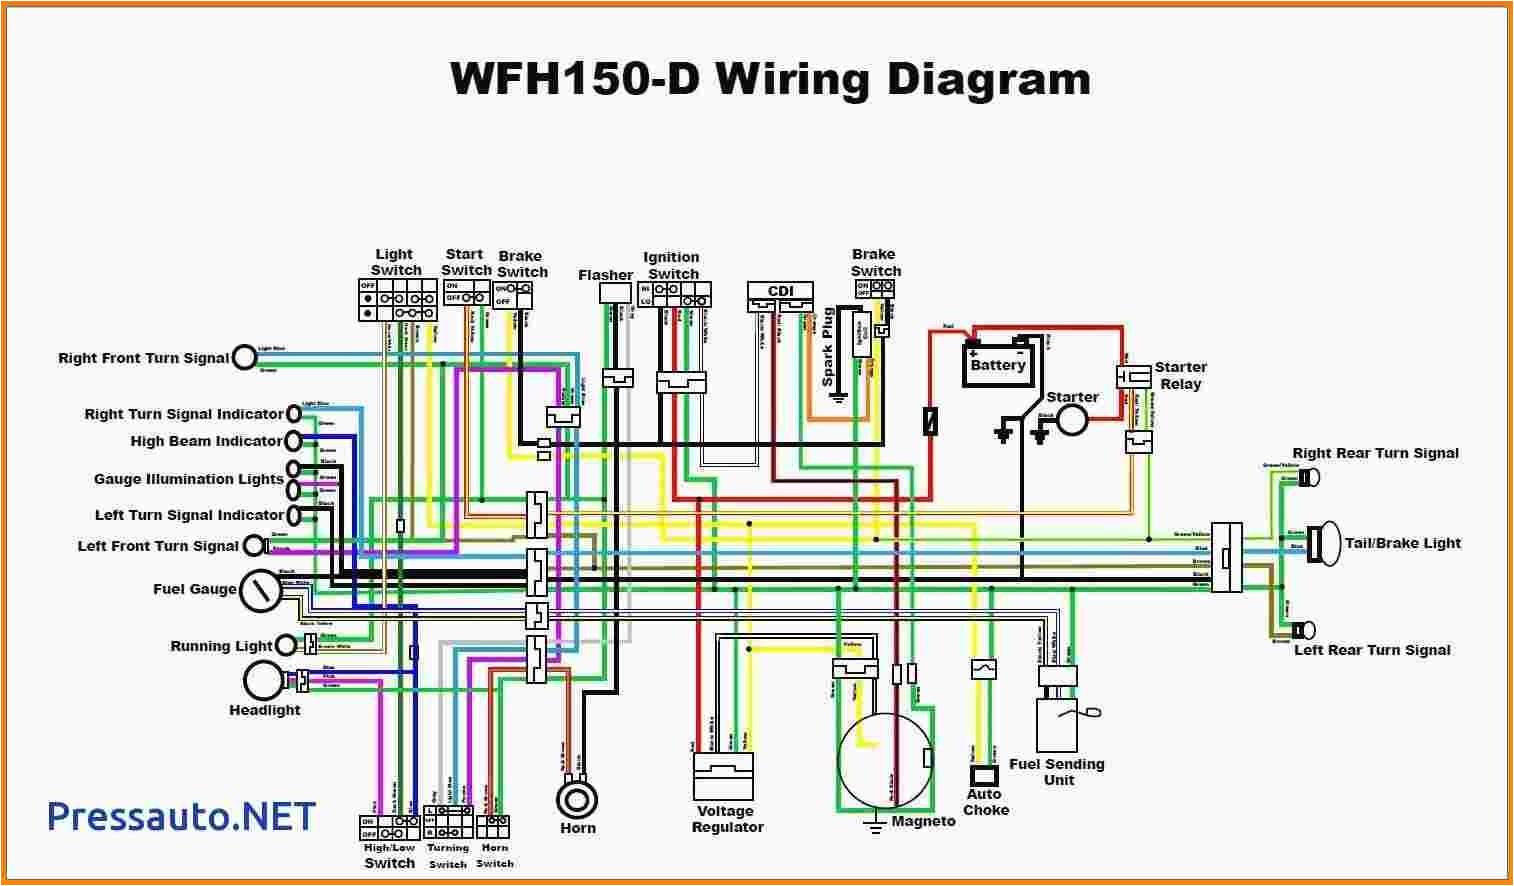 kazuma redcat 110cc wiring diagram wiring diagram usedredcat wiring diagram wiring diagram paper kazuma redcat 110cc